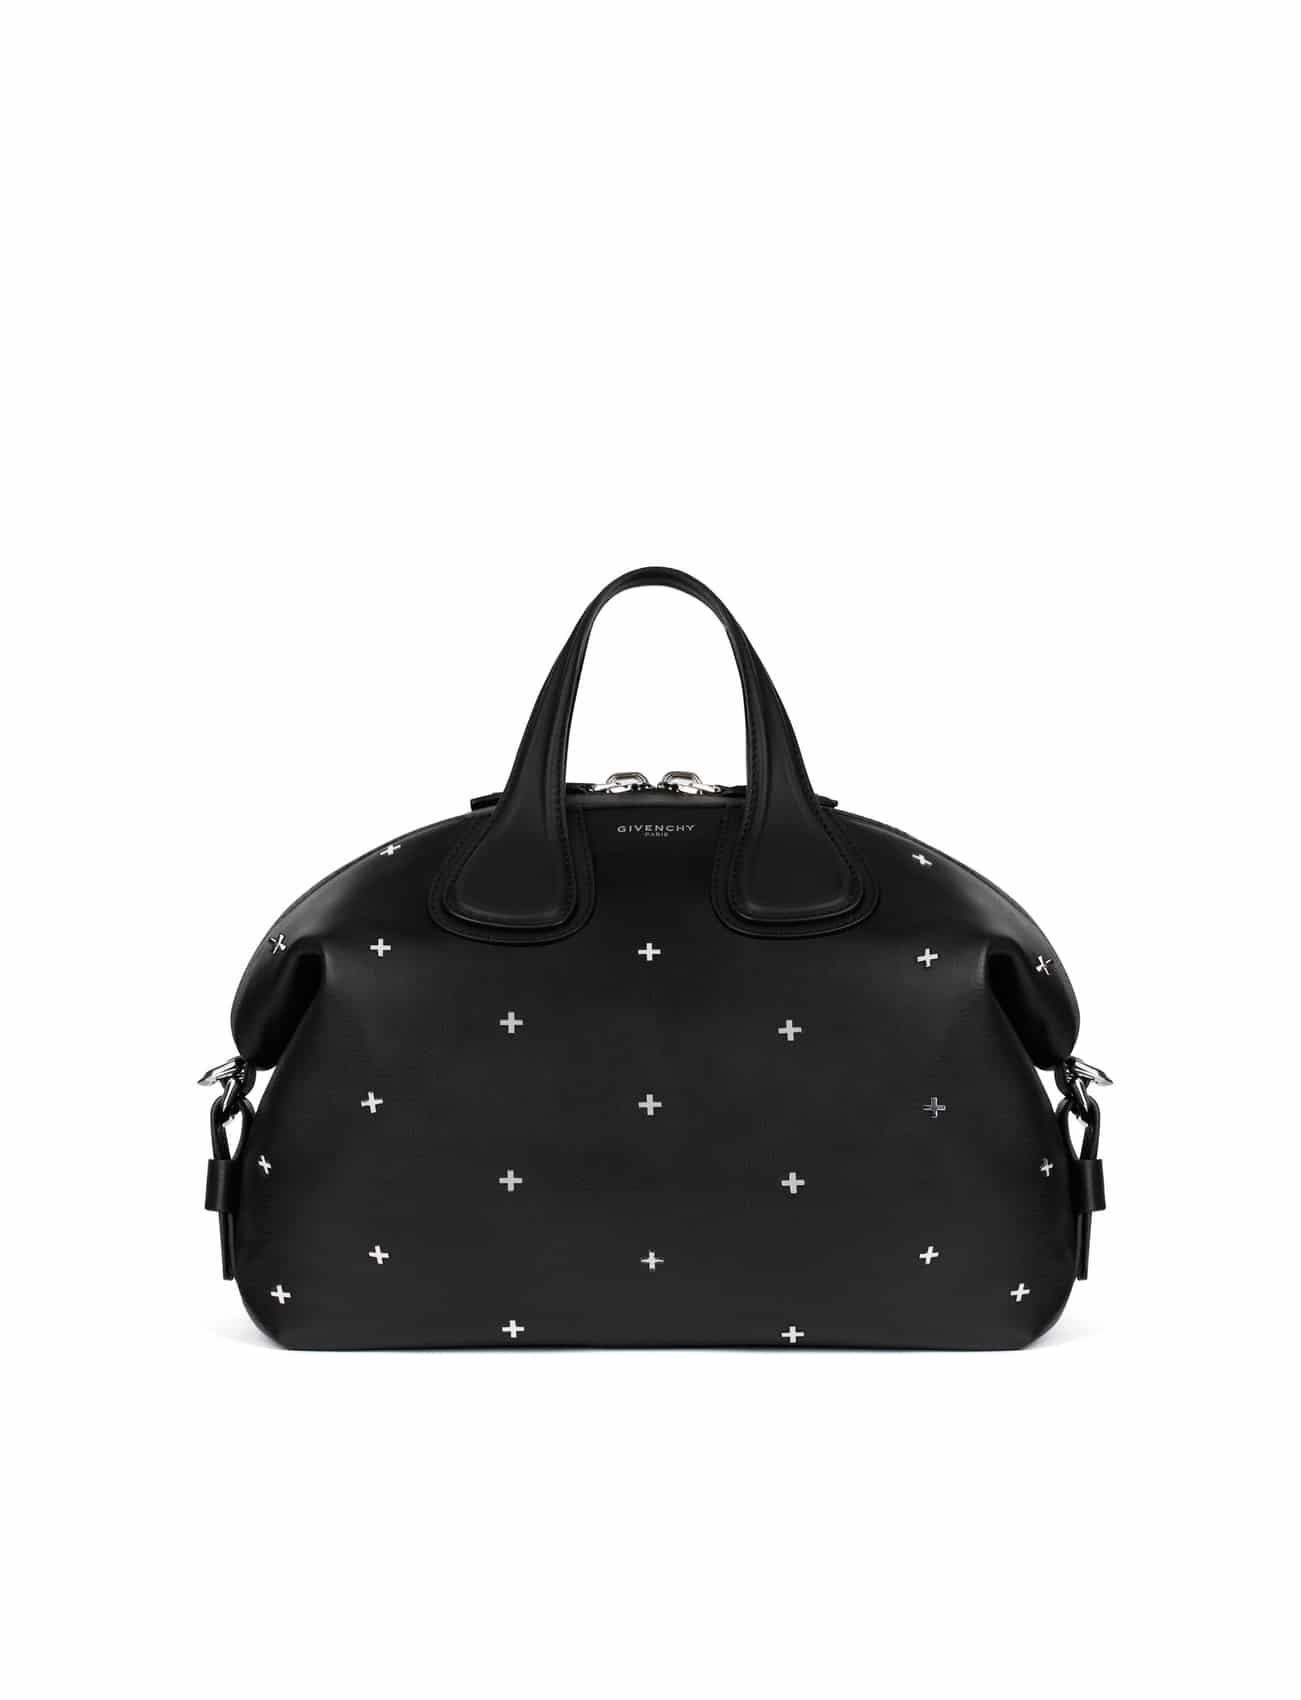 2dab274817 Givenchy Black Embellished with Metal Crosses Nightingale Medium Bag